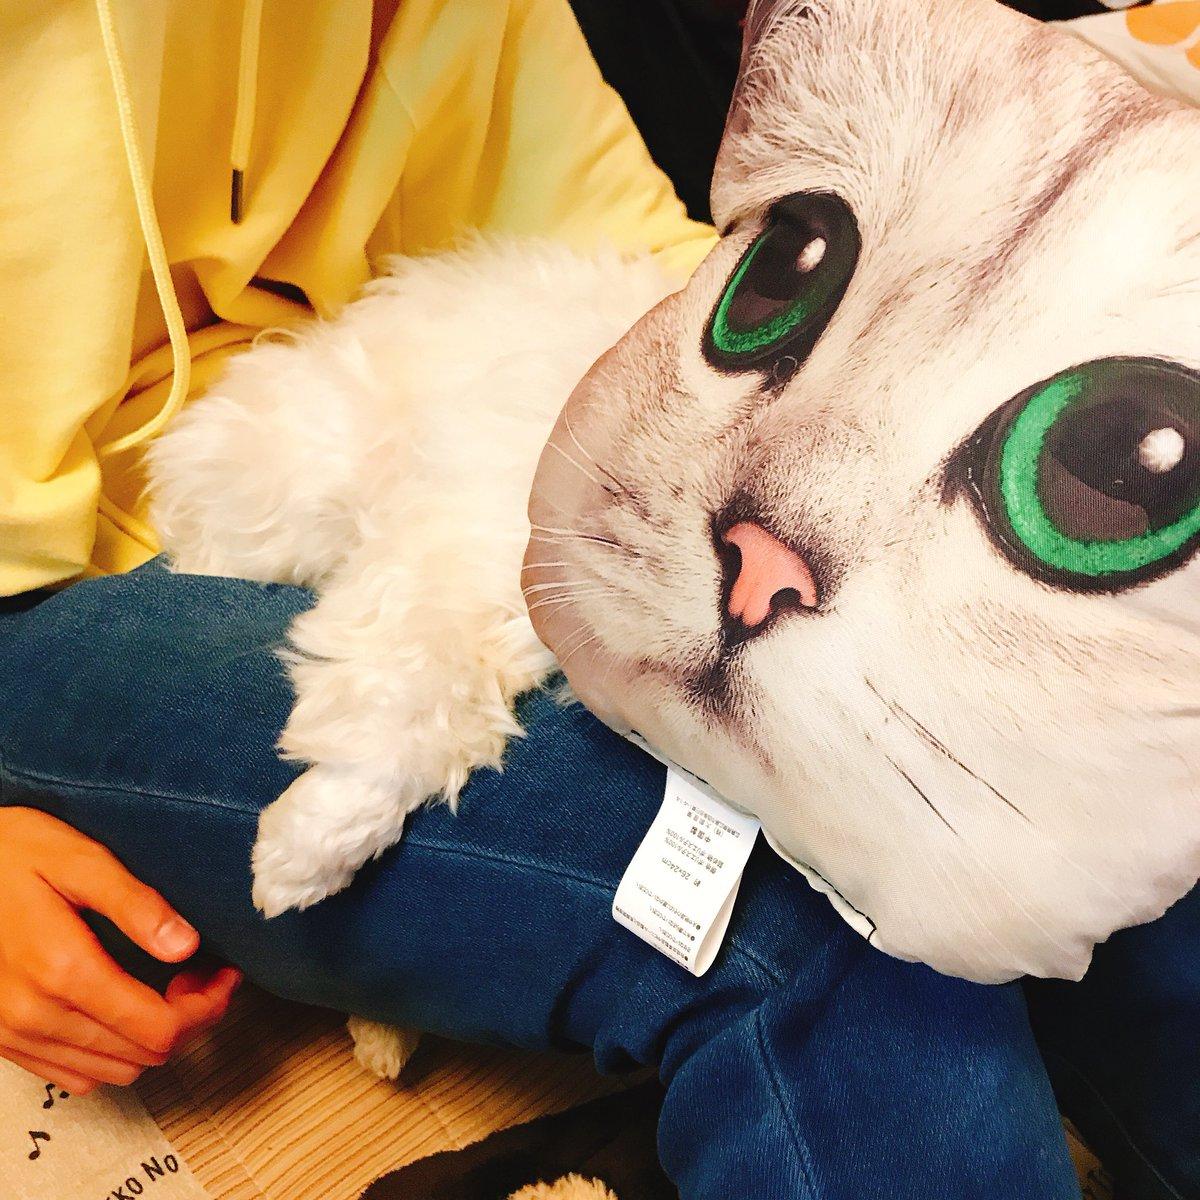 test ツイッターメディア - ヌコ化現象 #猫化 #ダイソー #猫グッツ #ヌコ https://t.co/O85pzC2T3h